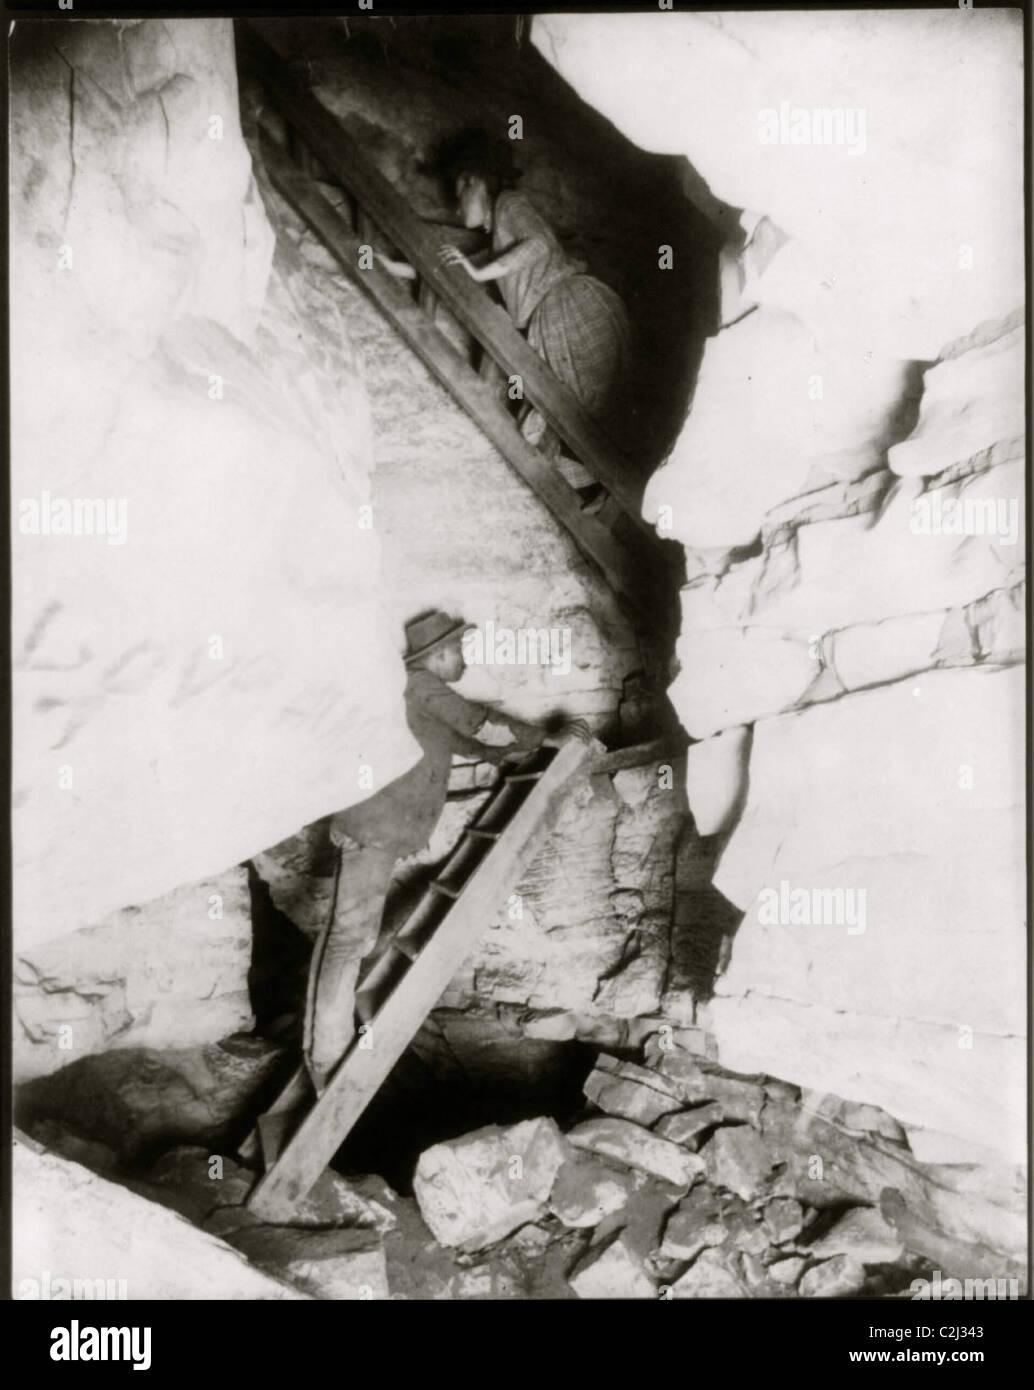 Mammoth Cave, Edmondson, Co., Ky. - Stock Image